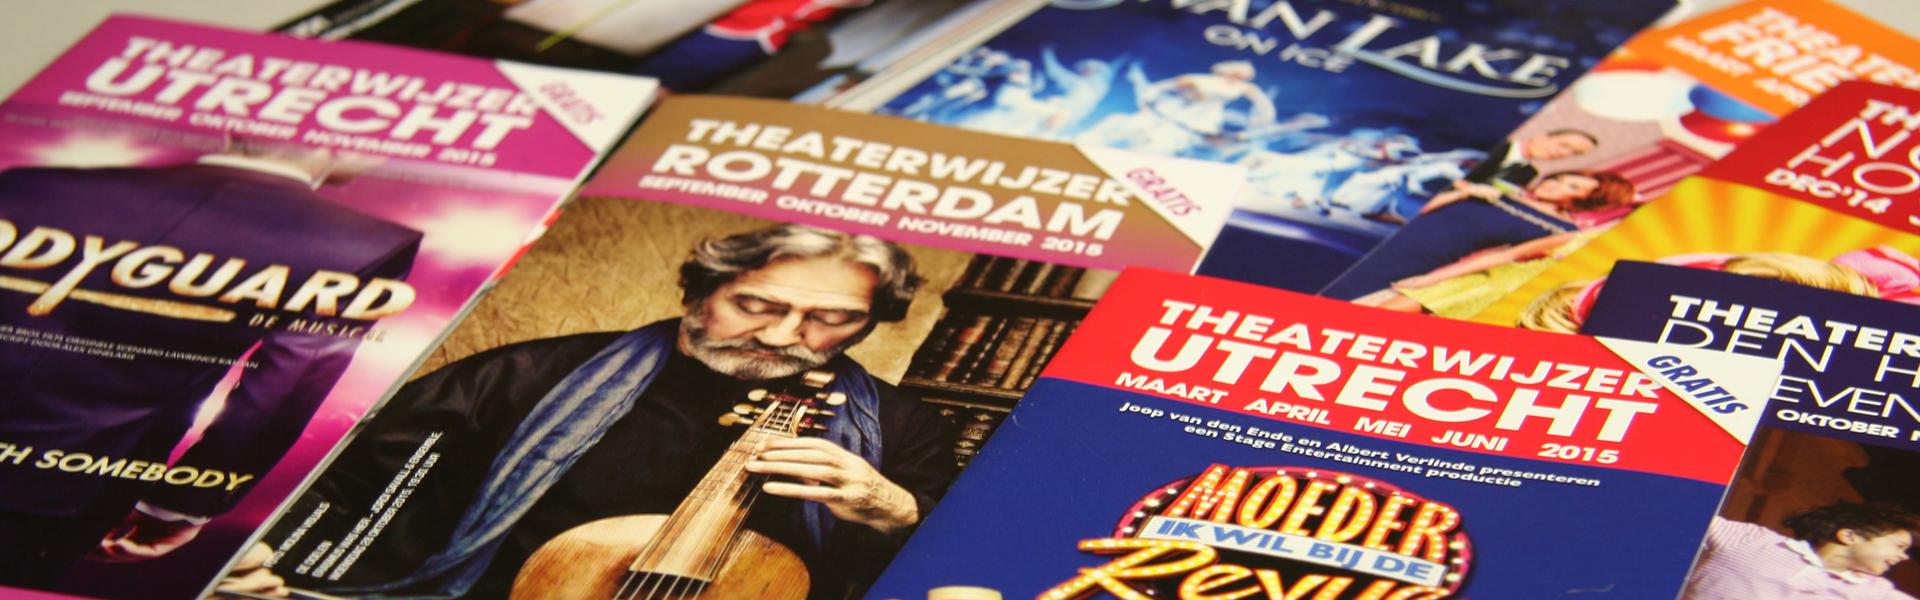 Theaterwijzers.nl slide2